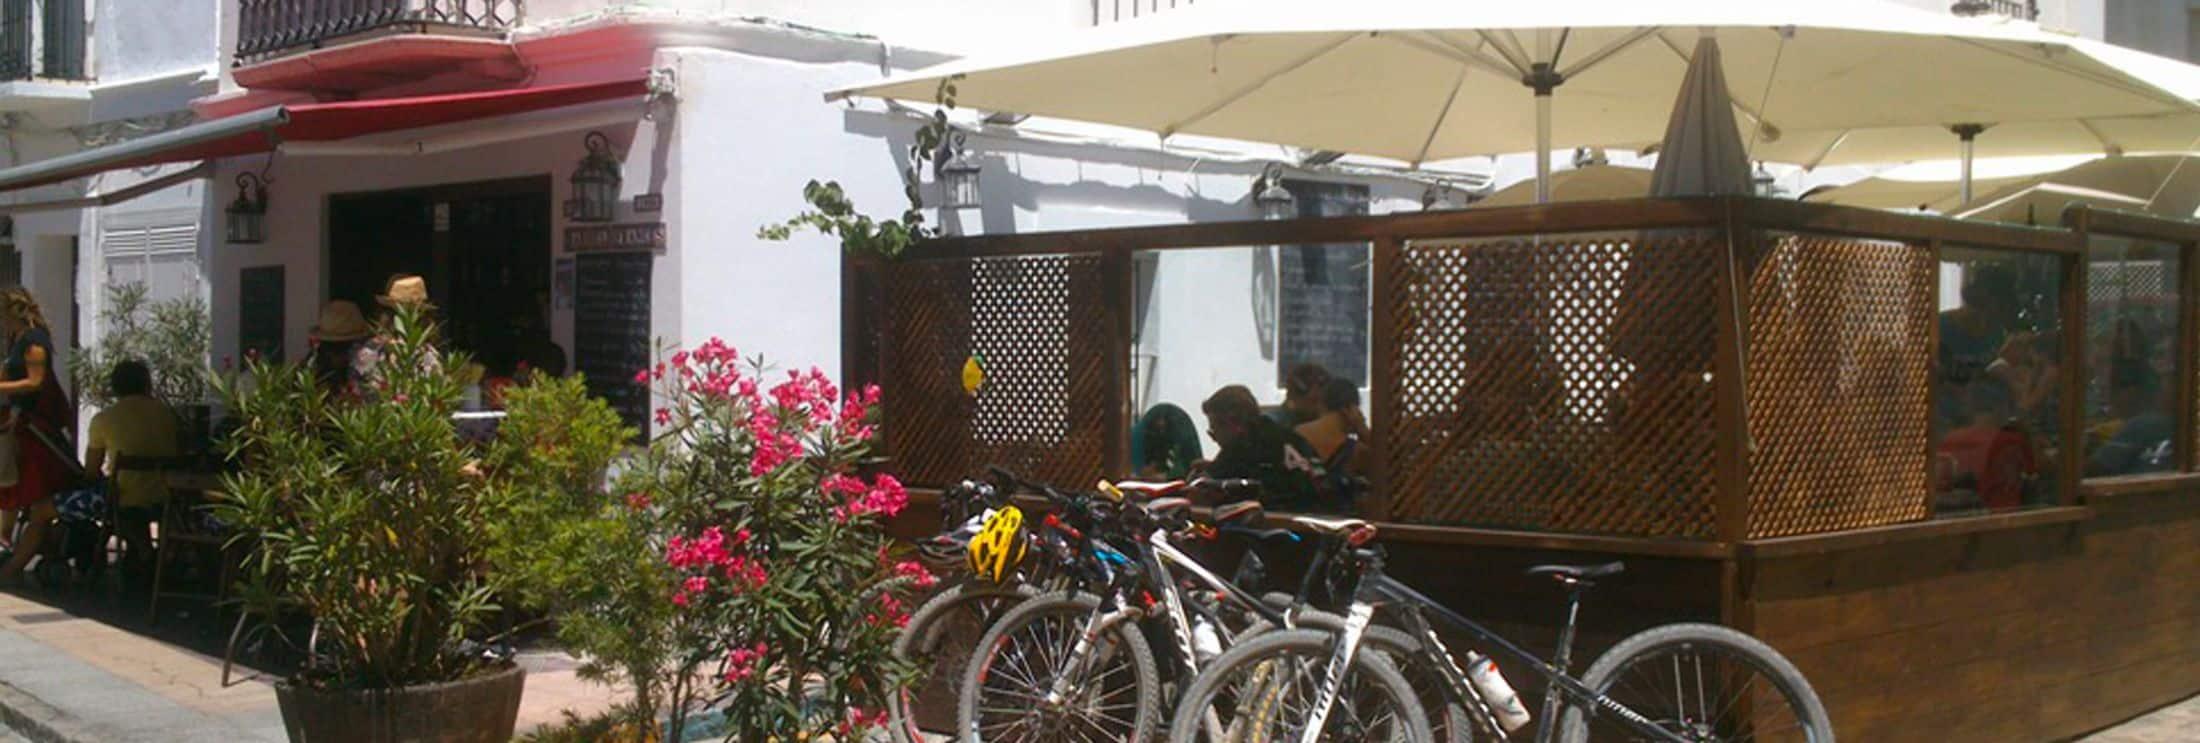 Bar el Francès, the best Tapas Bar in Tarifa, Fresh Tuna, Pulpo